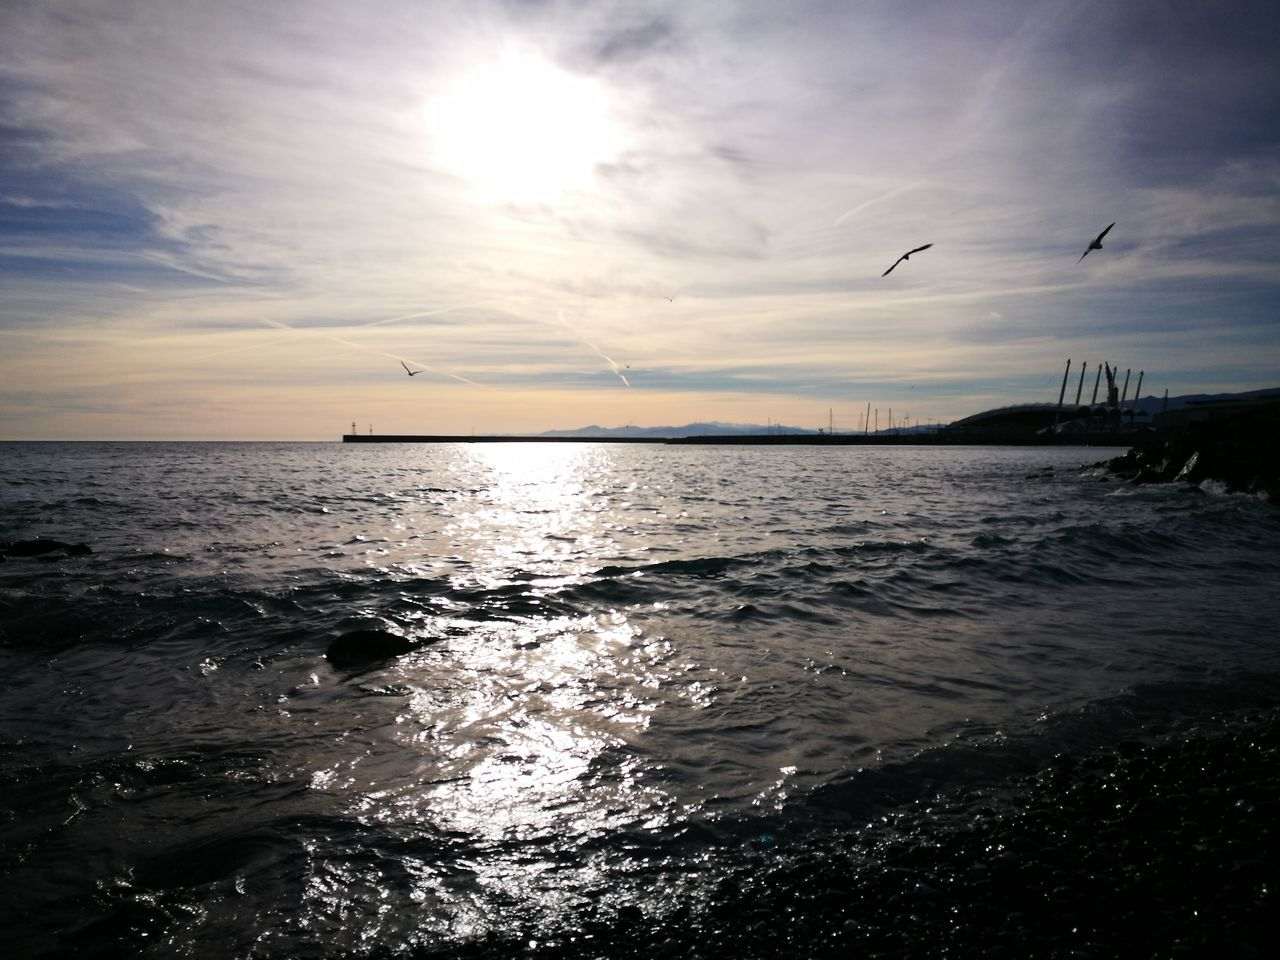 Cloud - Sky Beauty In Nature Beach No People Sky Sea Sunset BirdFlying Horizon Over Water Scenics Nature